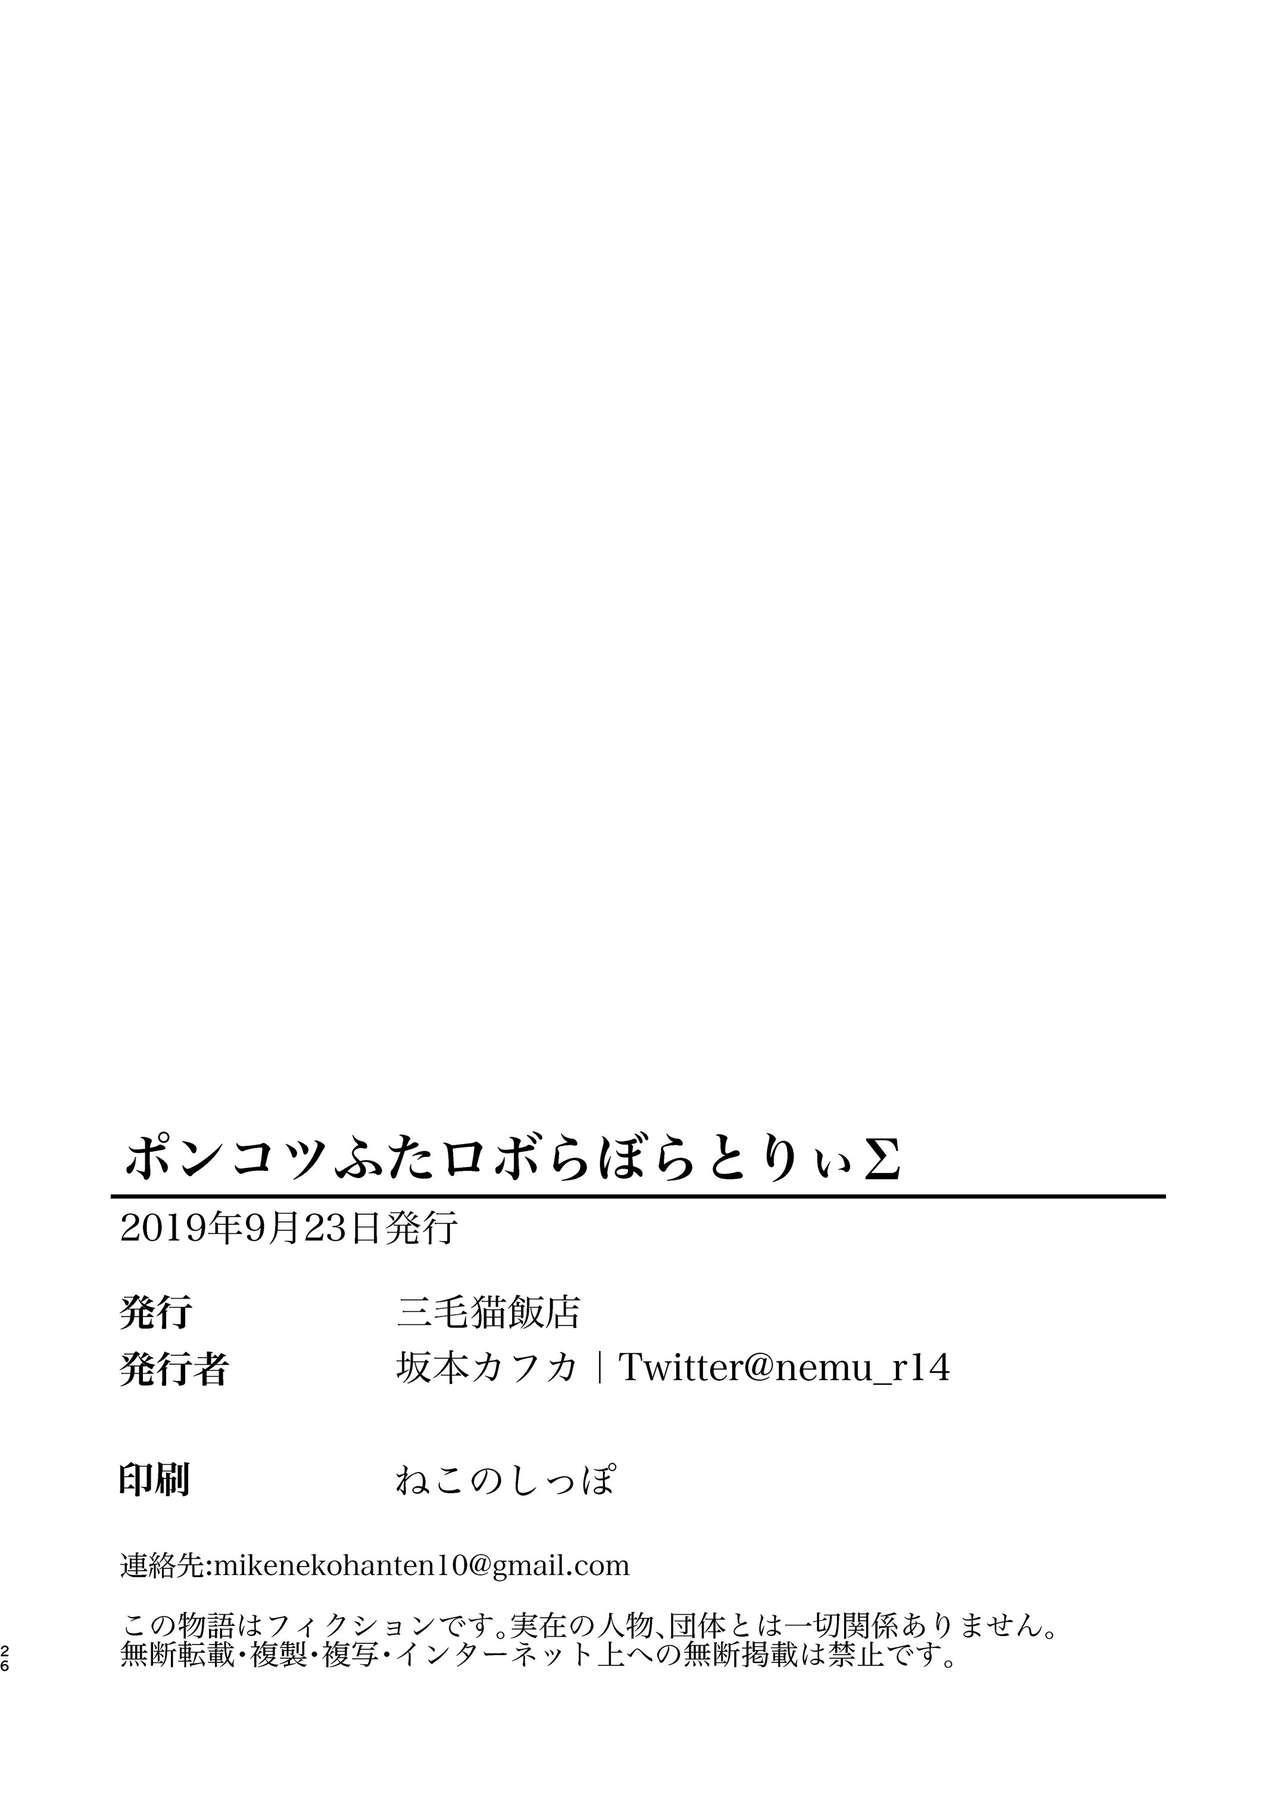 Ponkotsu Futa Robot Laboratory Σ 25